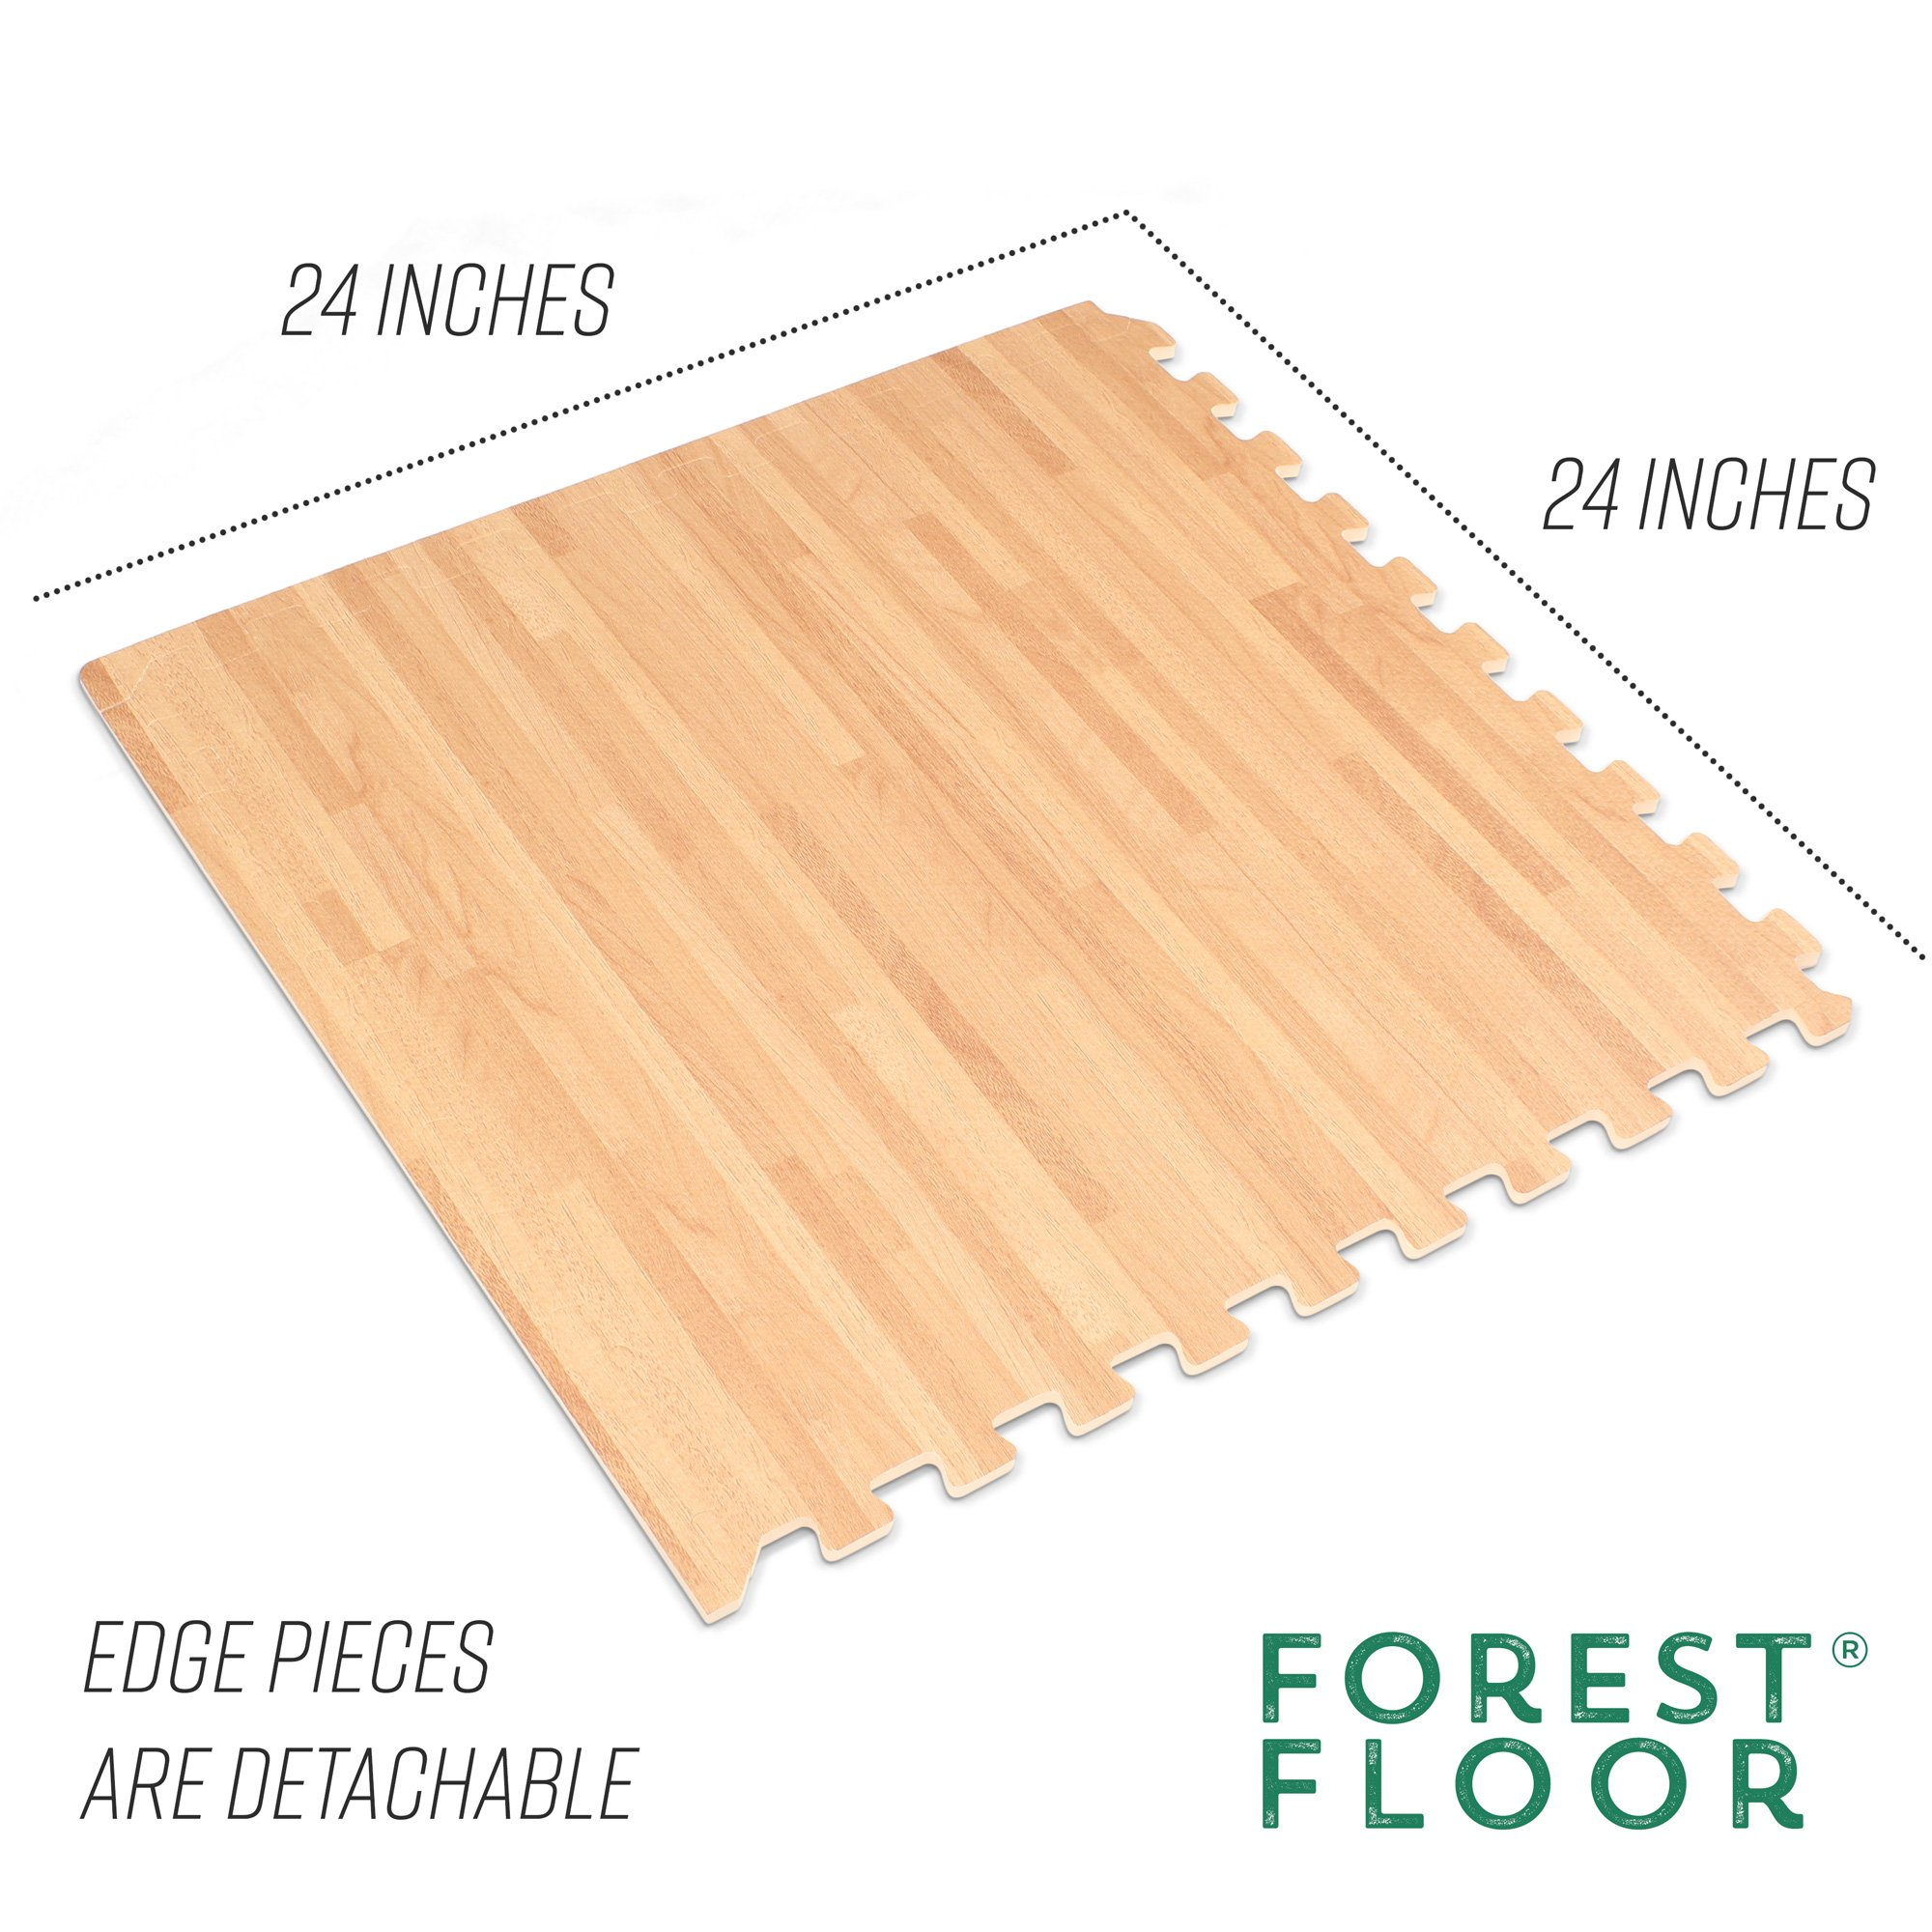 Forest Floor 3/8'' Thick Printed Wood Grain Interlocking Foam Floor Mats, 16 Sq Ft (4 Tiles), White Oak by Forest Floor (Image #4)